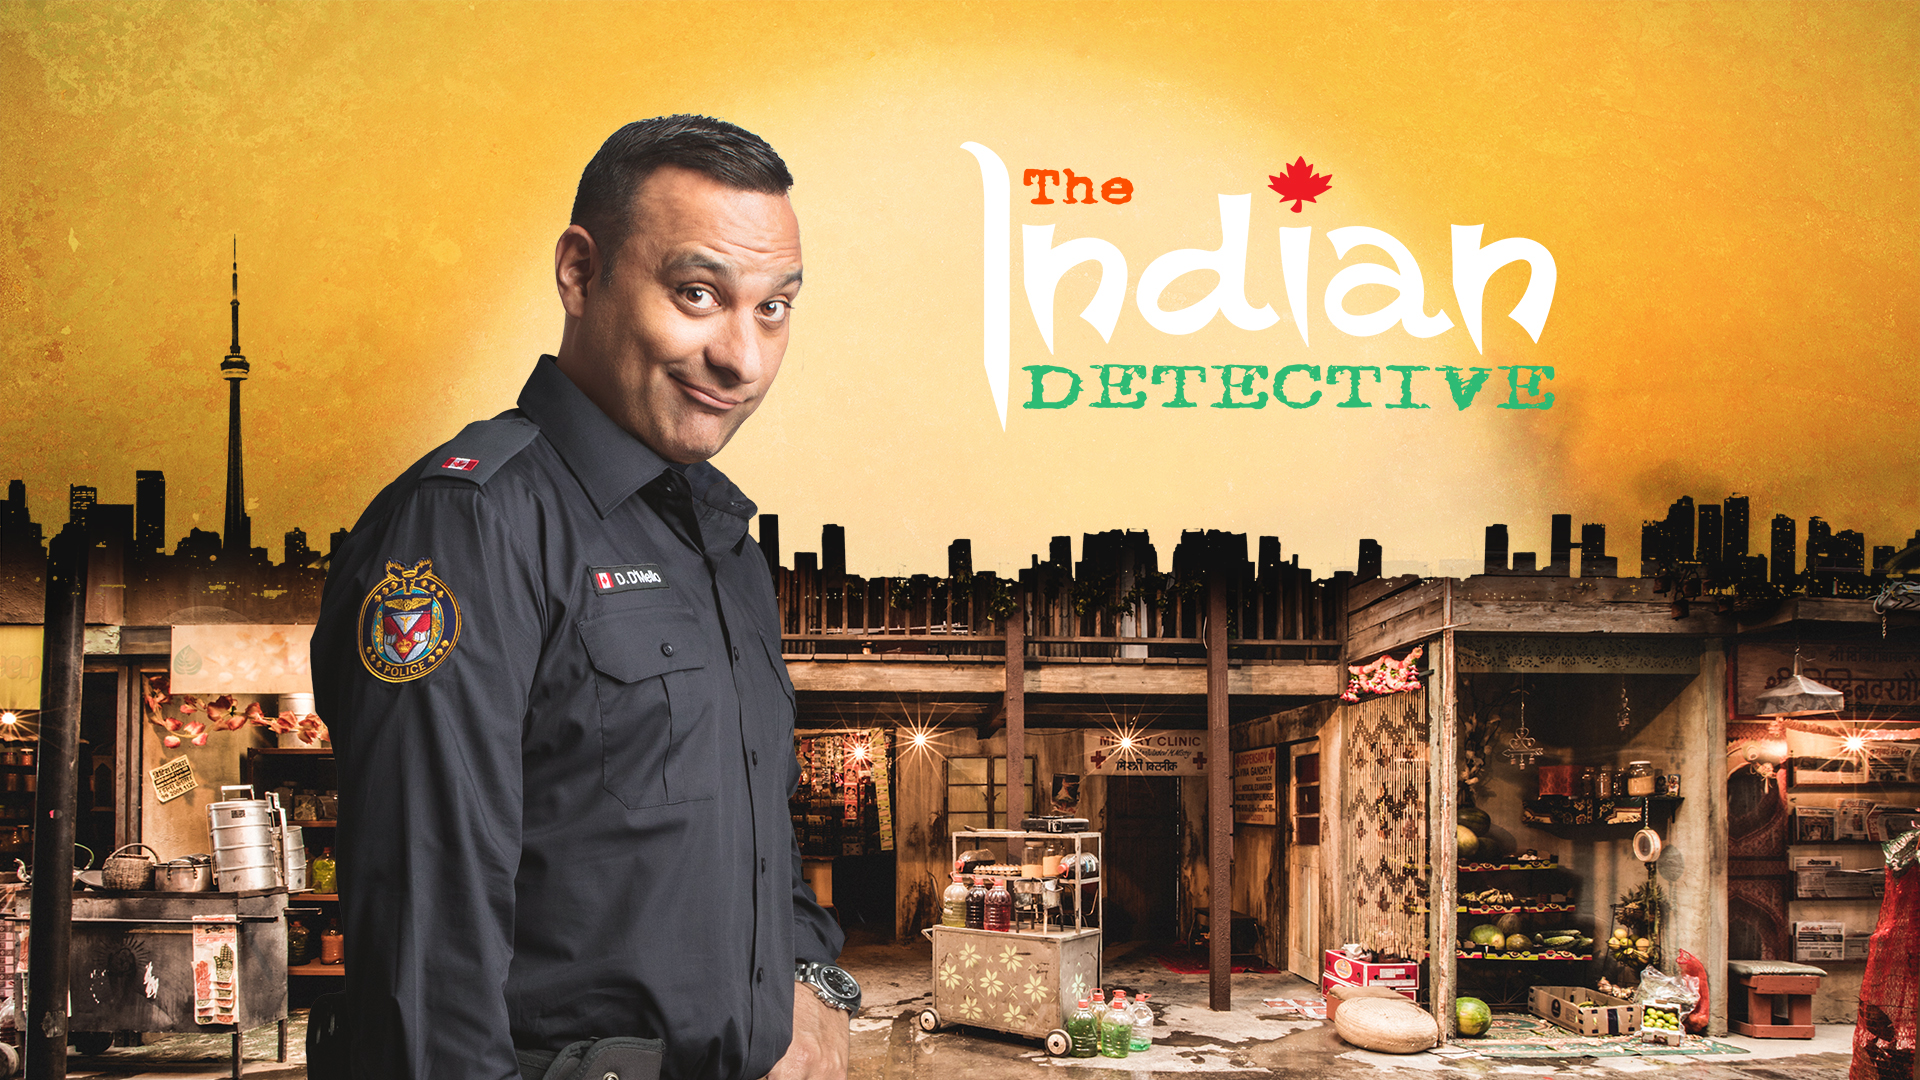 The Indian Detective Season 2